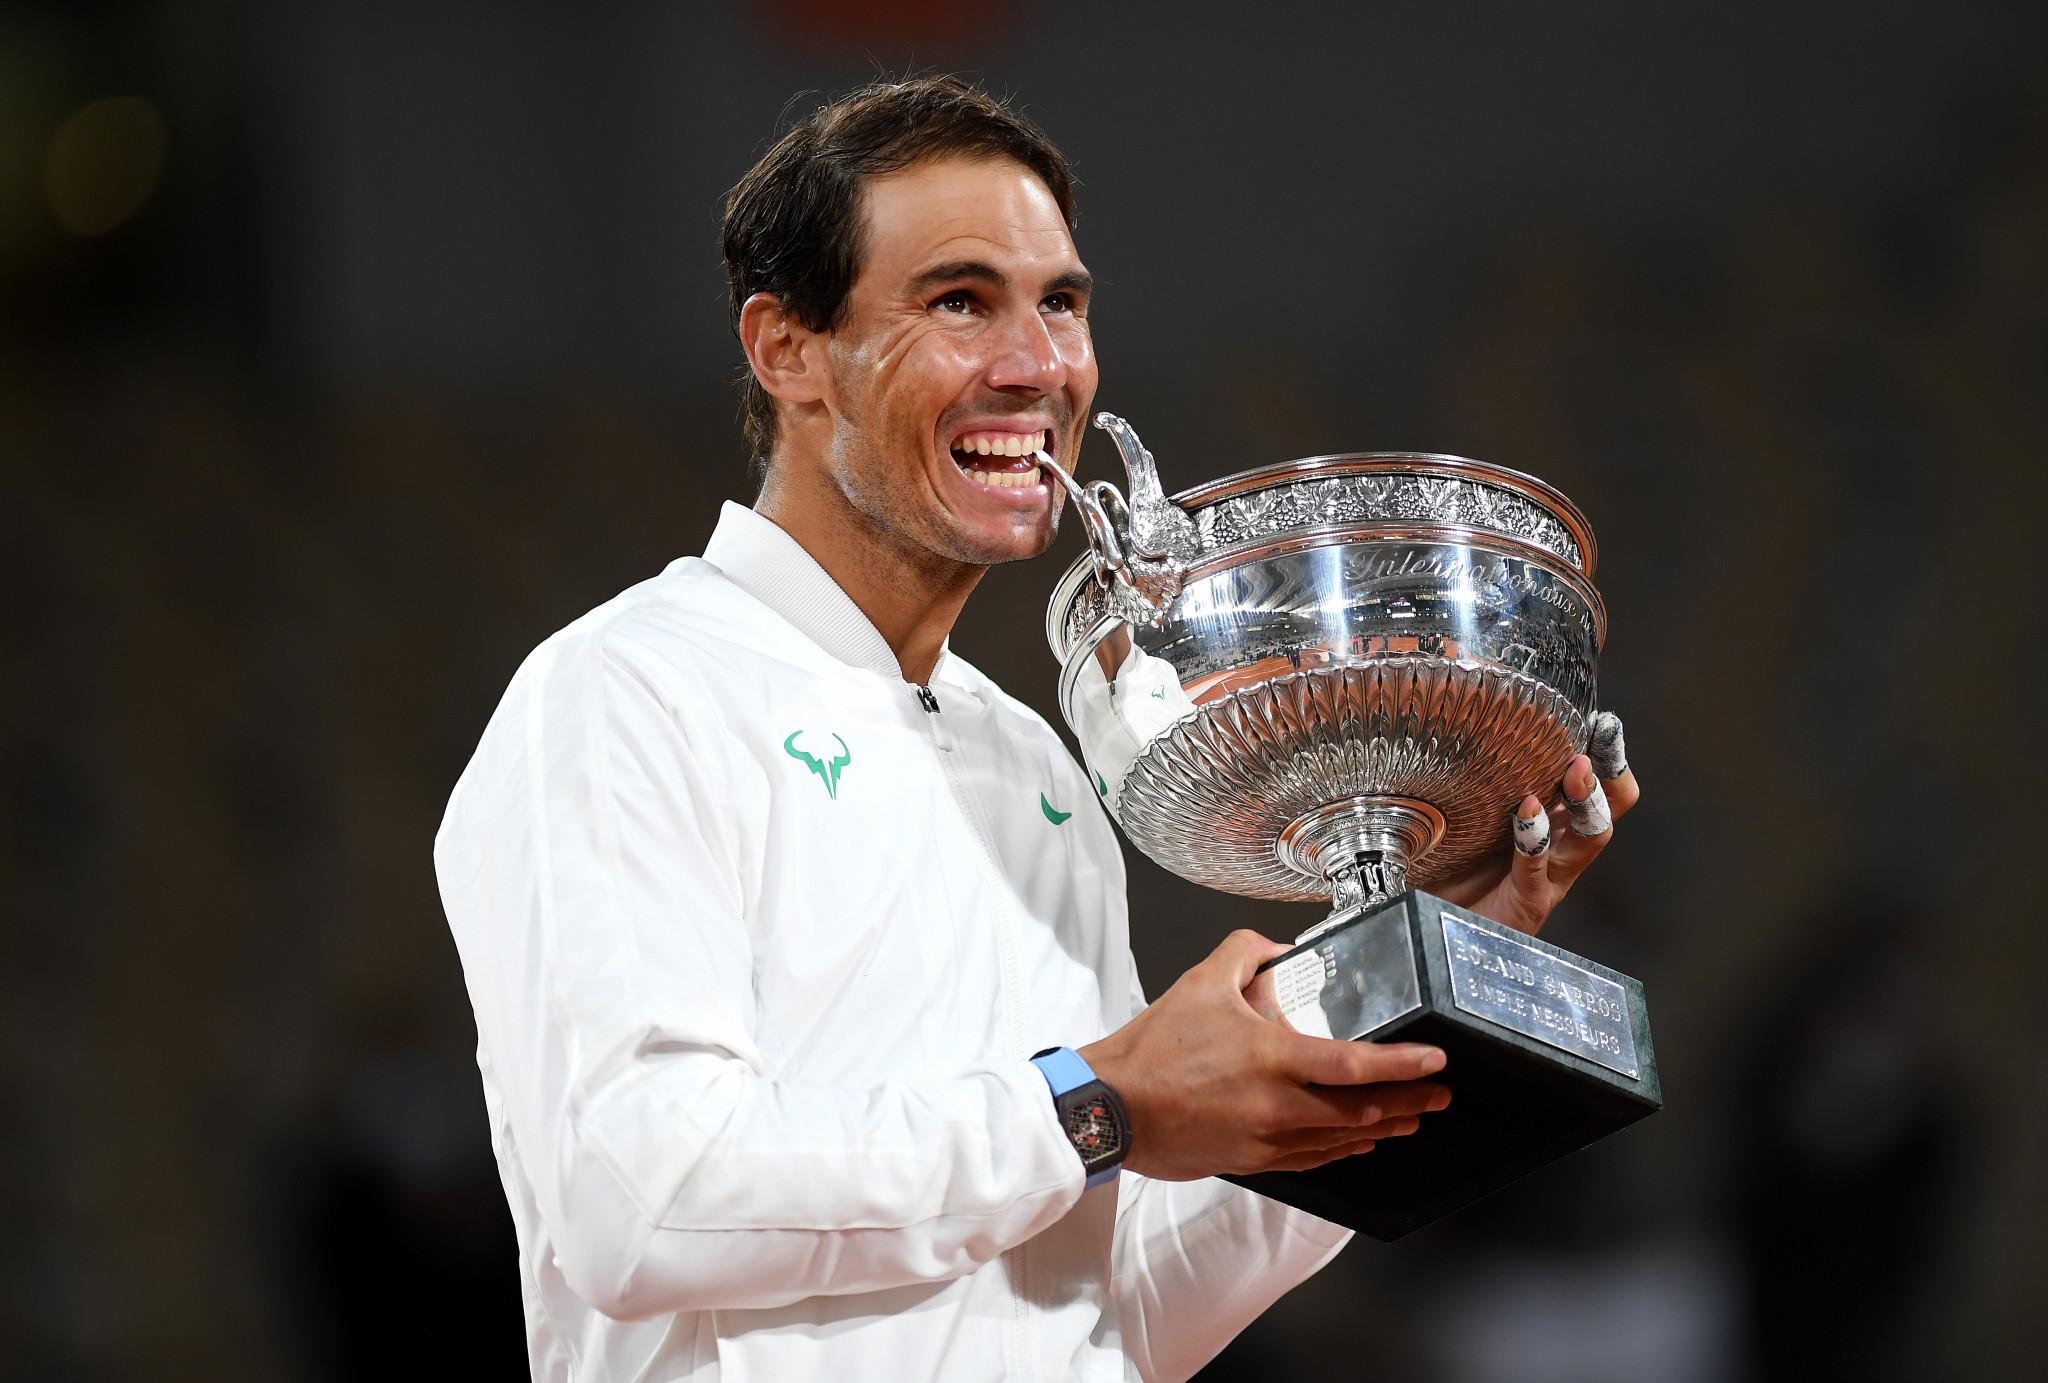 Nadal draws level with Federer on 20 Grand Slam singles titles after more joy at Roland Garros